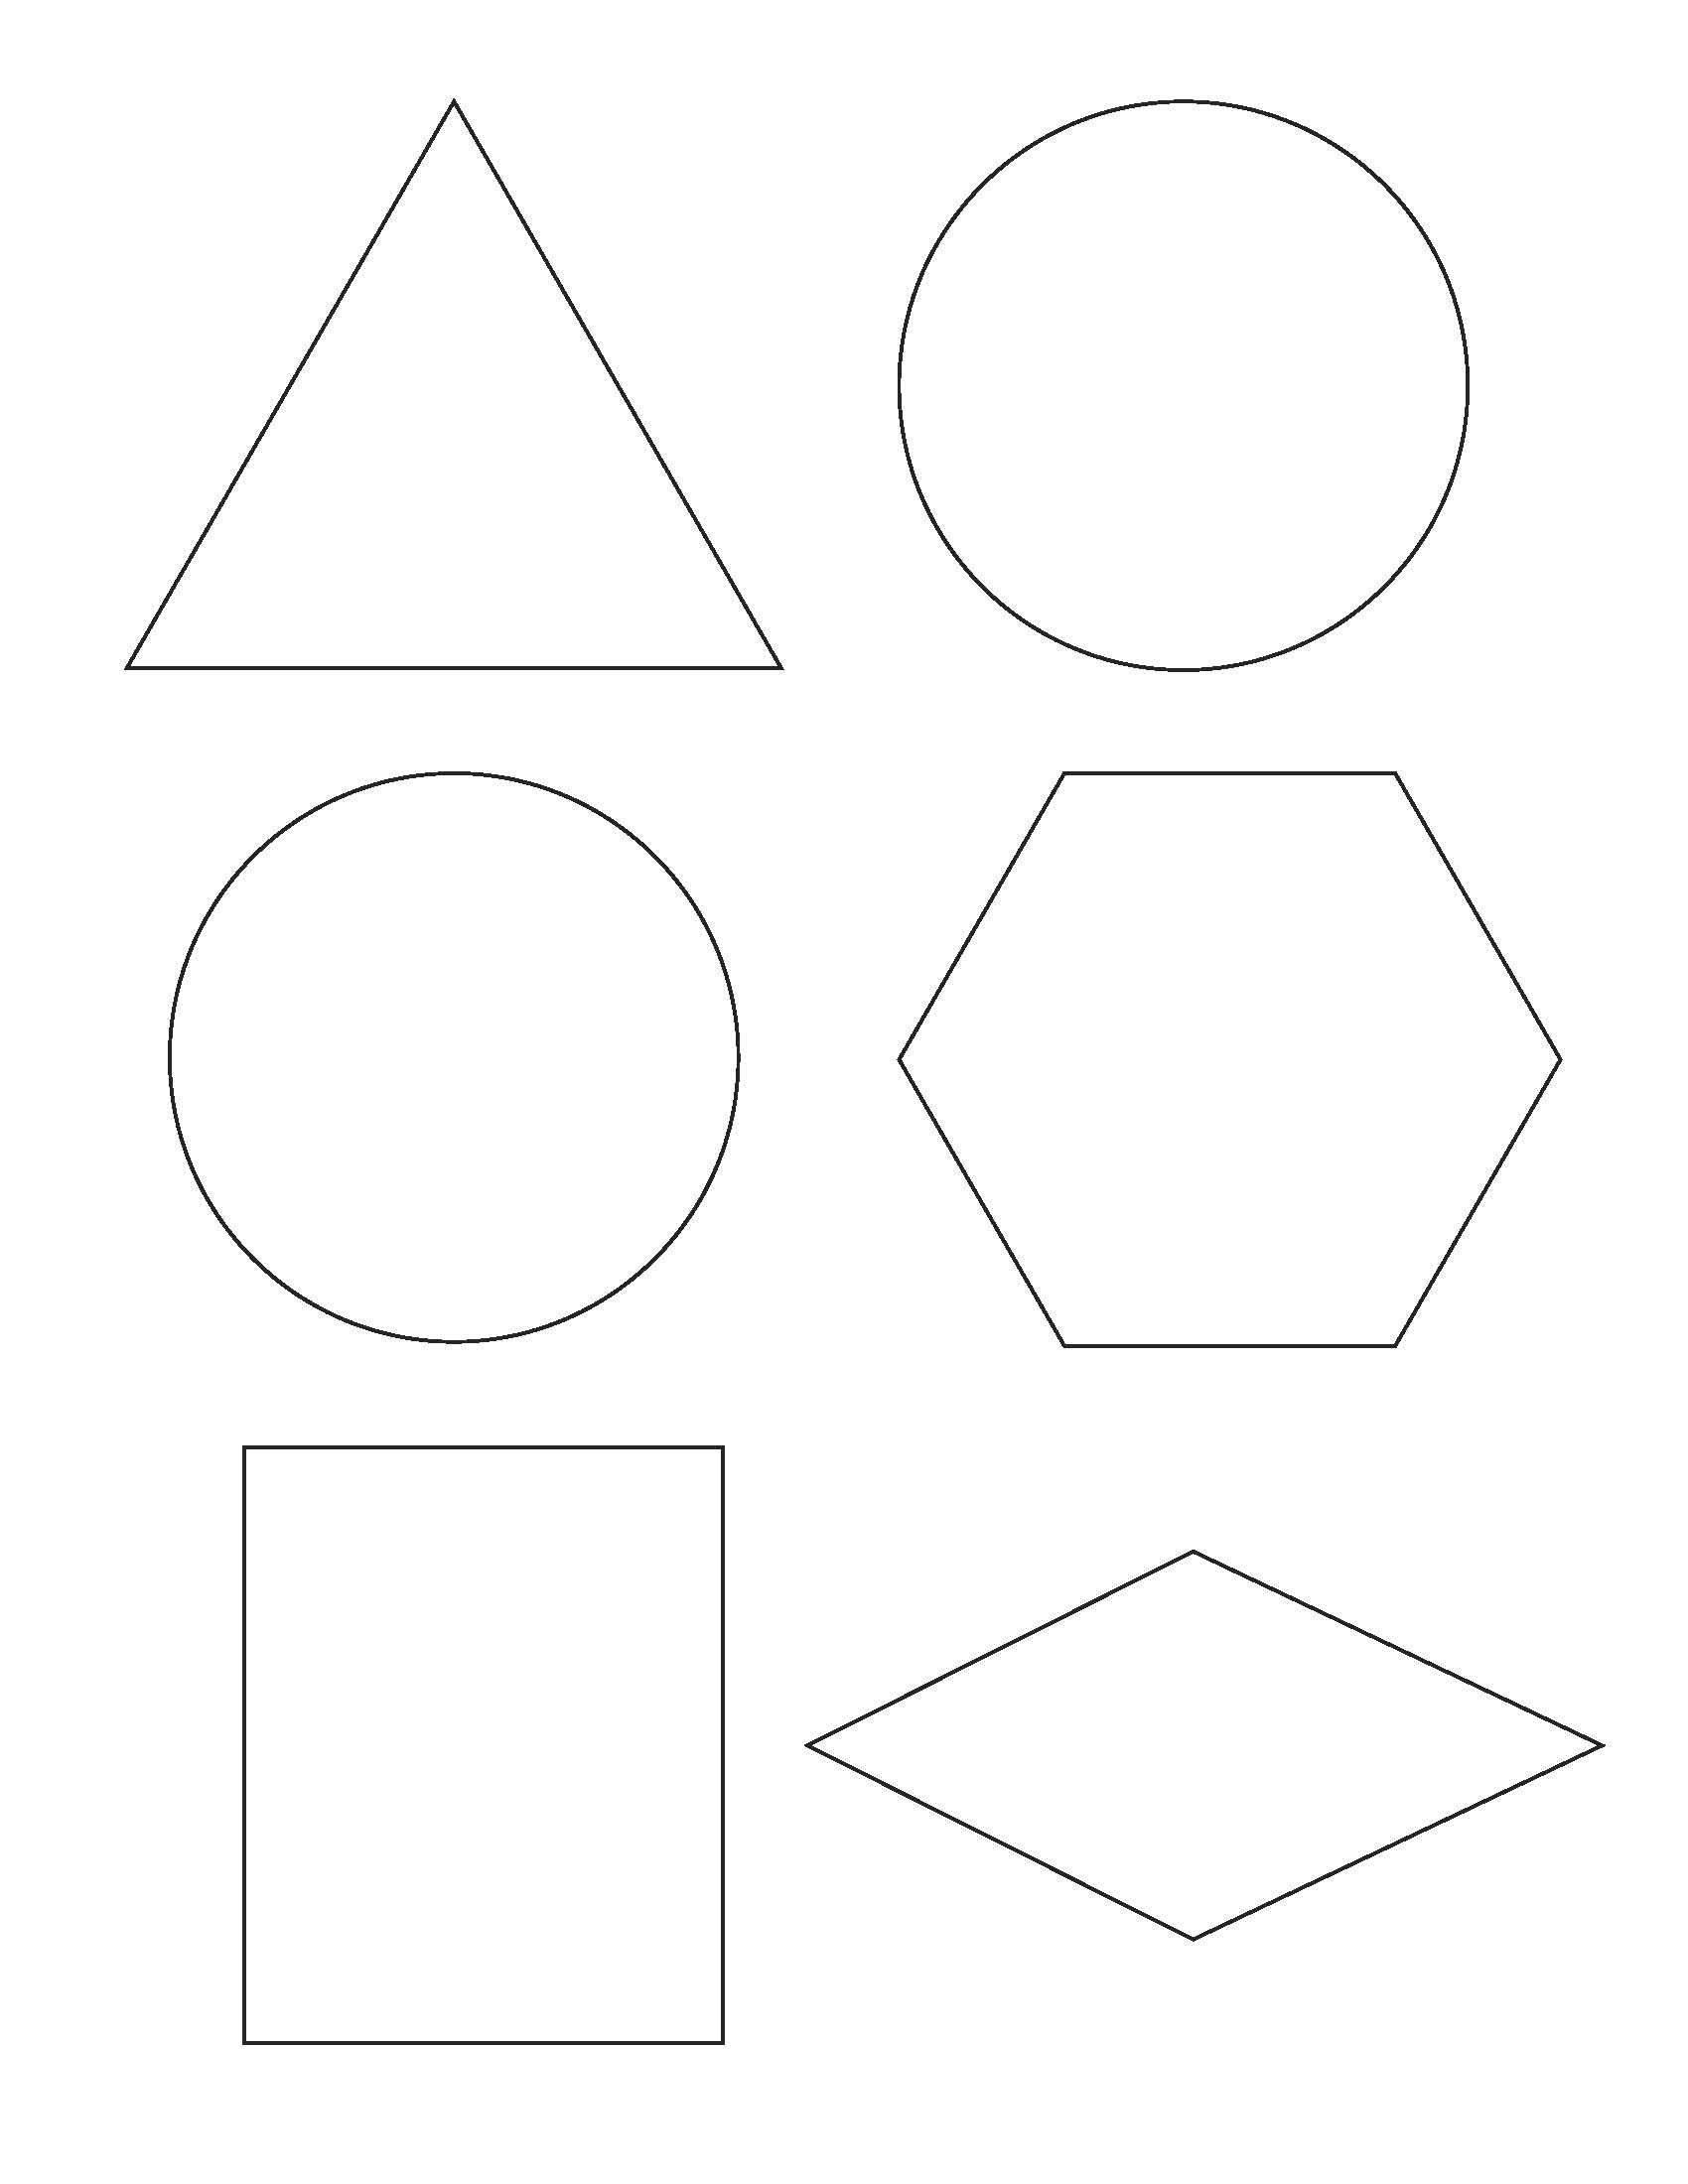 2D Shape Templates Printable – Pazzo - Free Shape Templates Printable